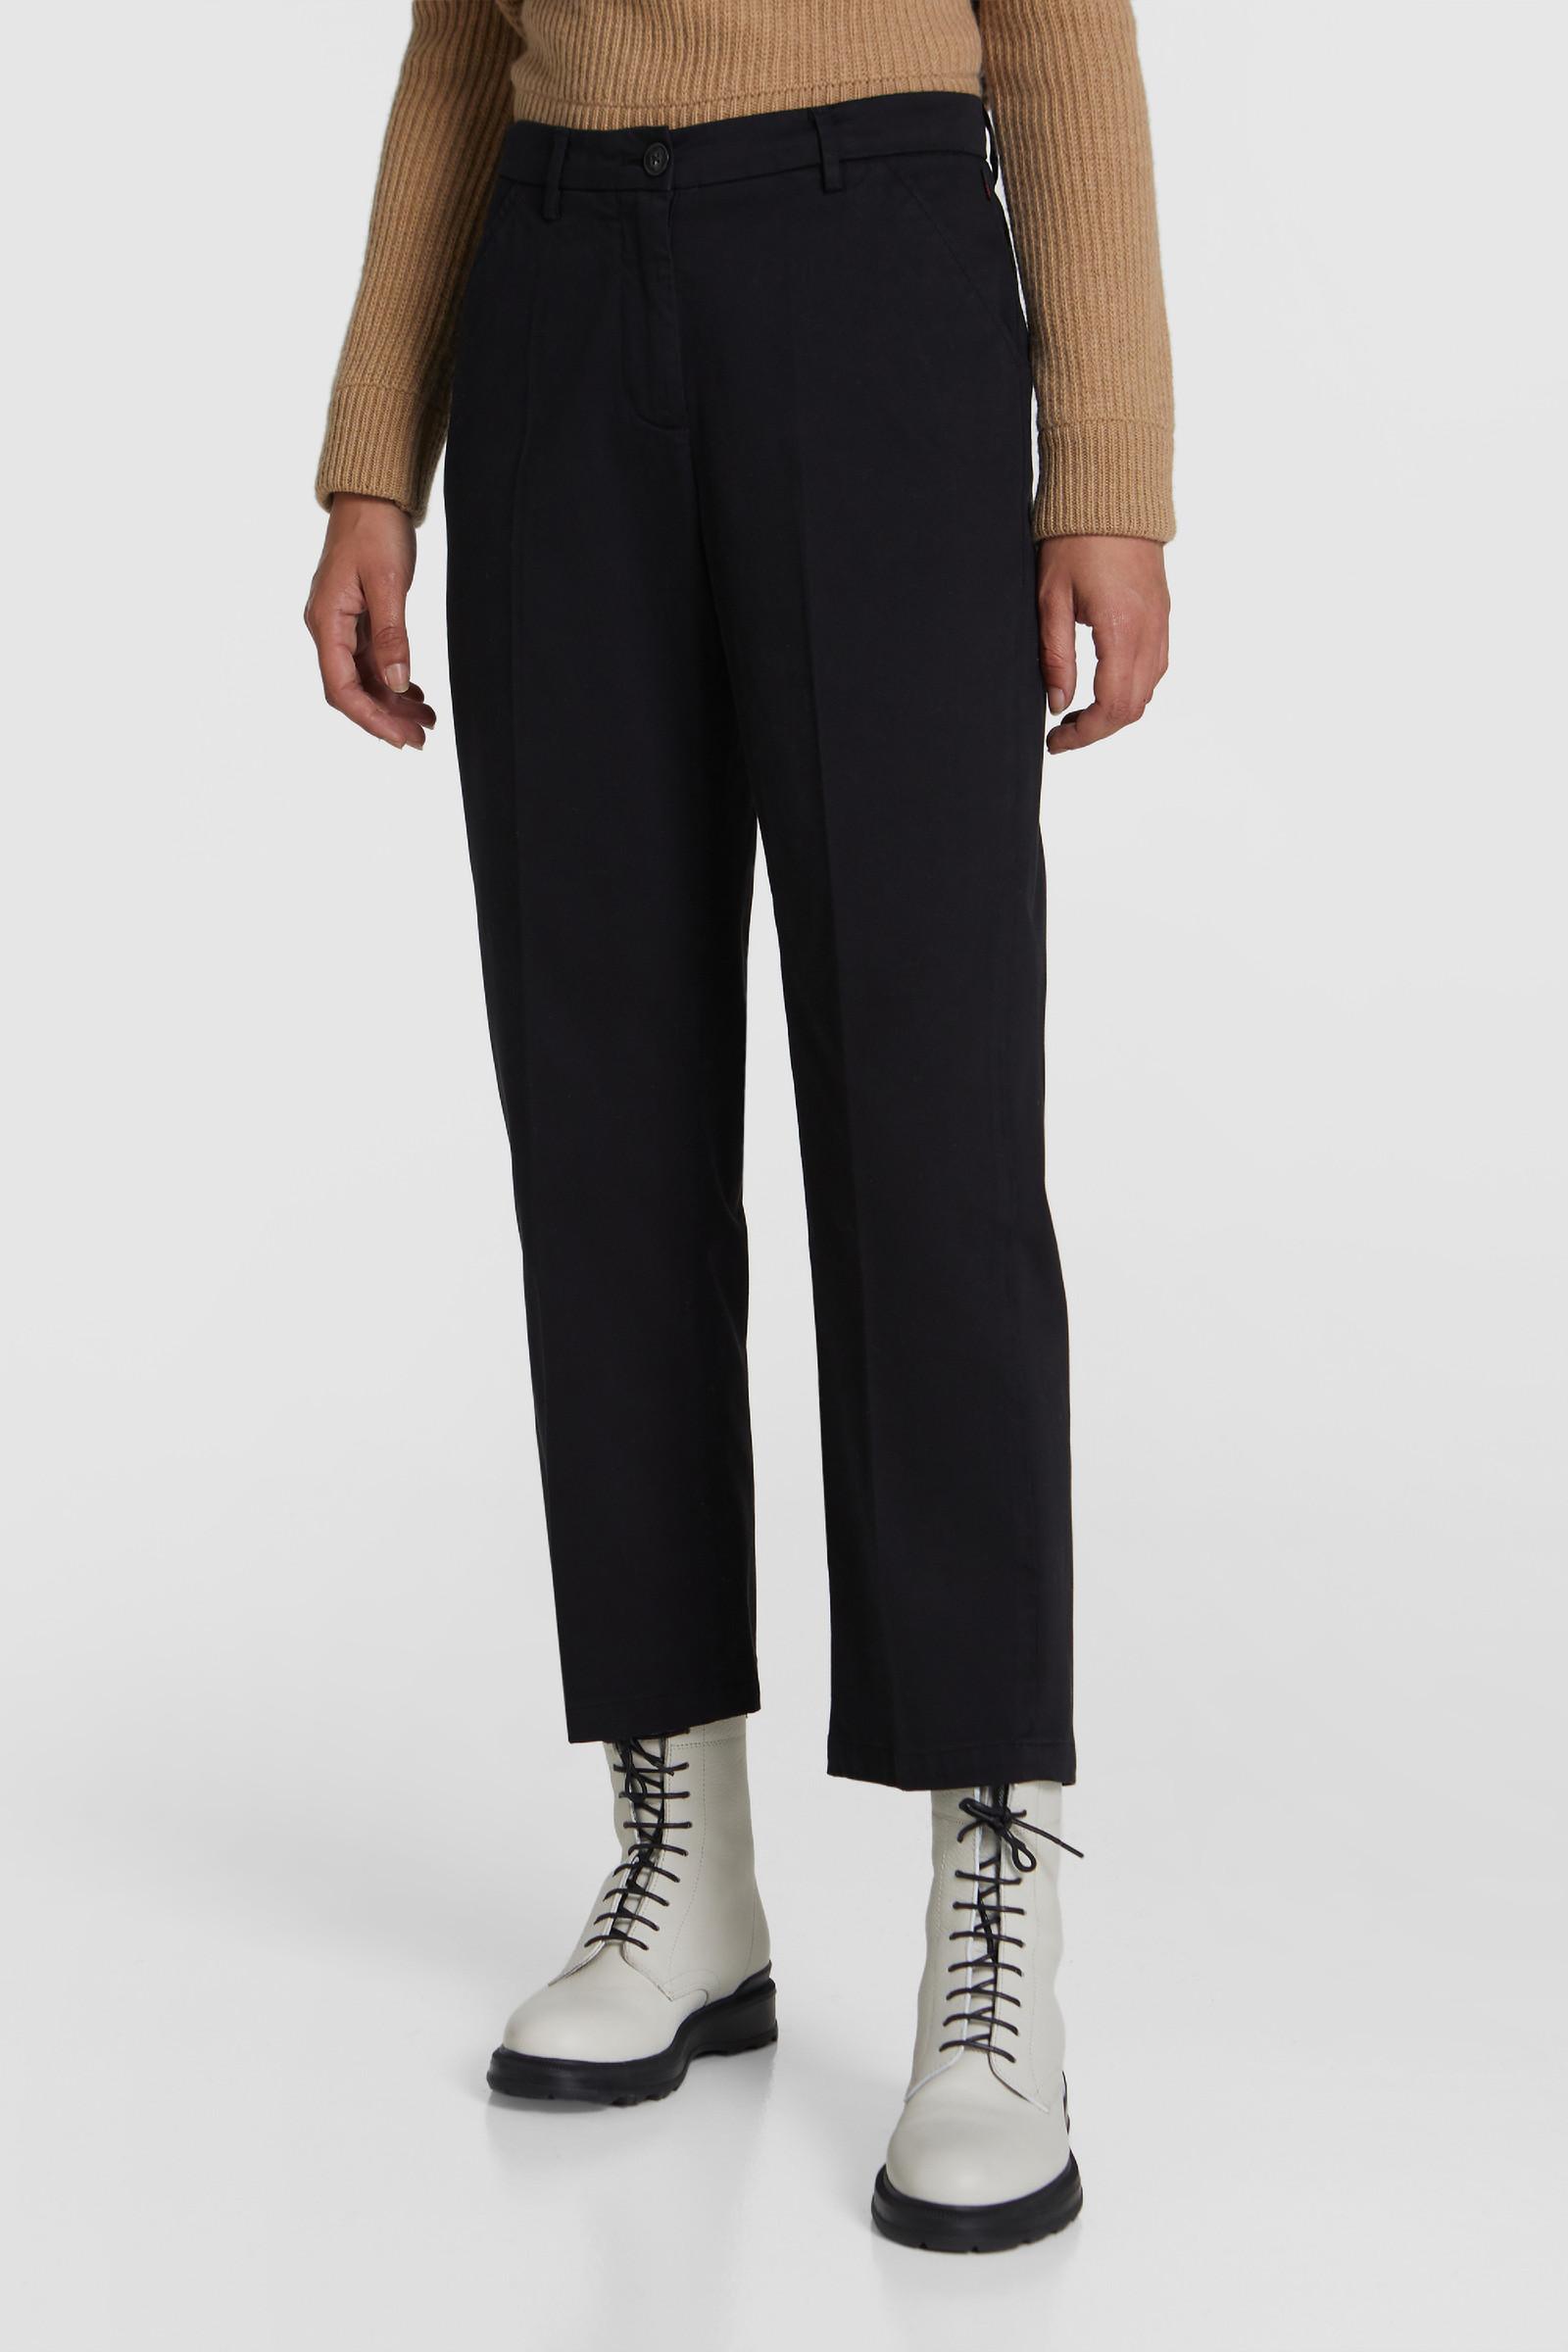 American Chino Pants